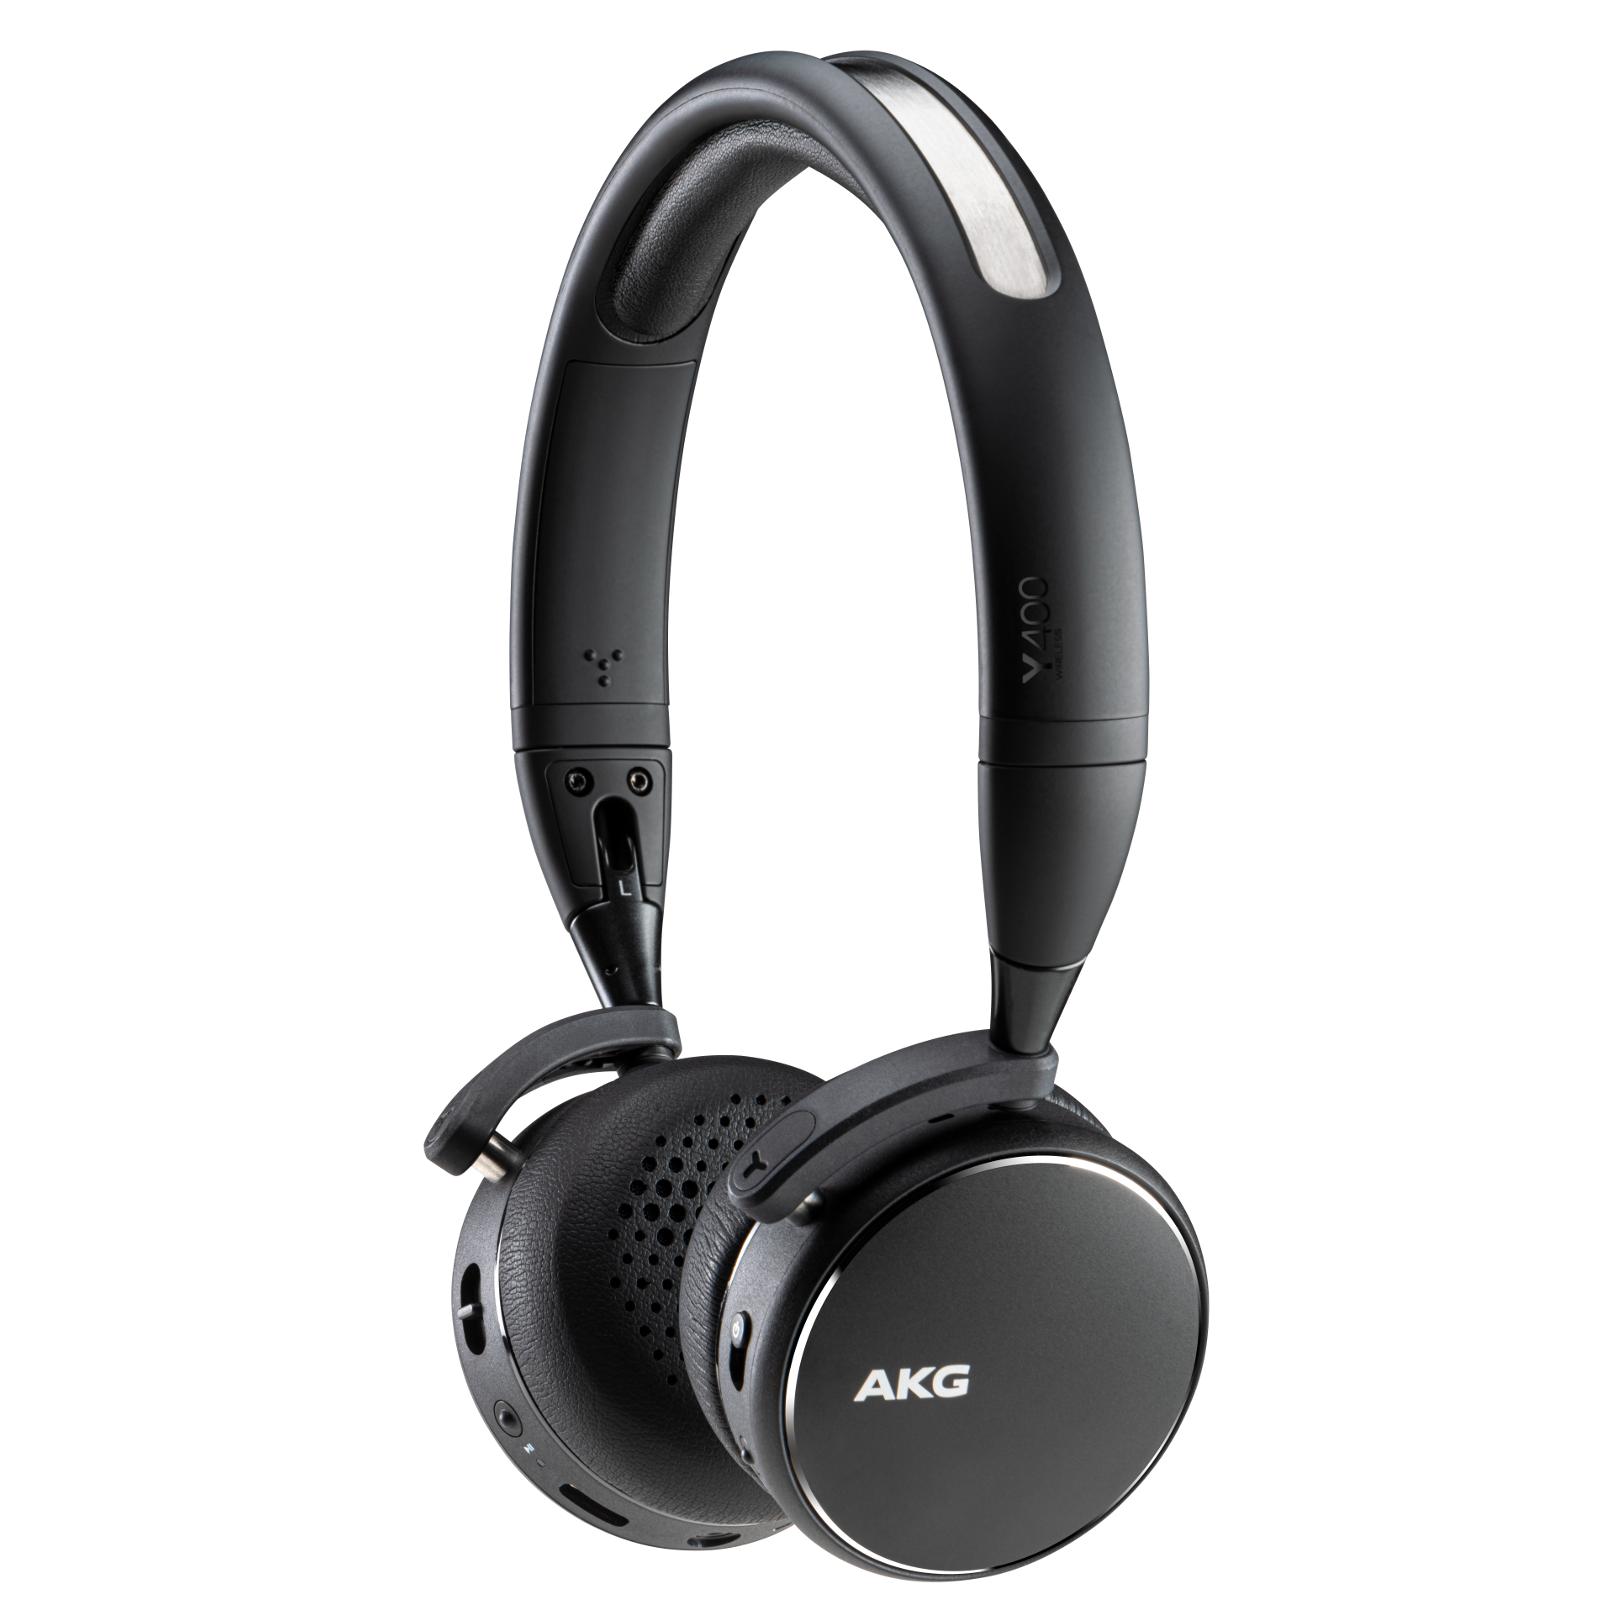 AKG Y400BT Bluetooth On Ear Headphones $29.99 + Free